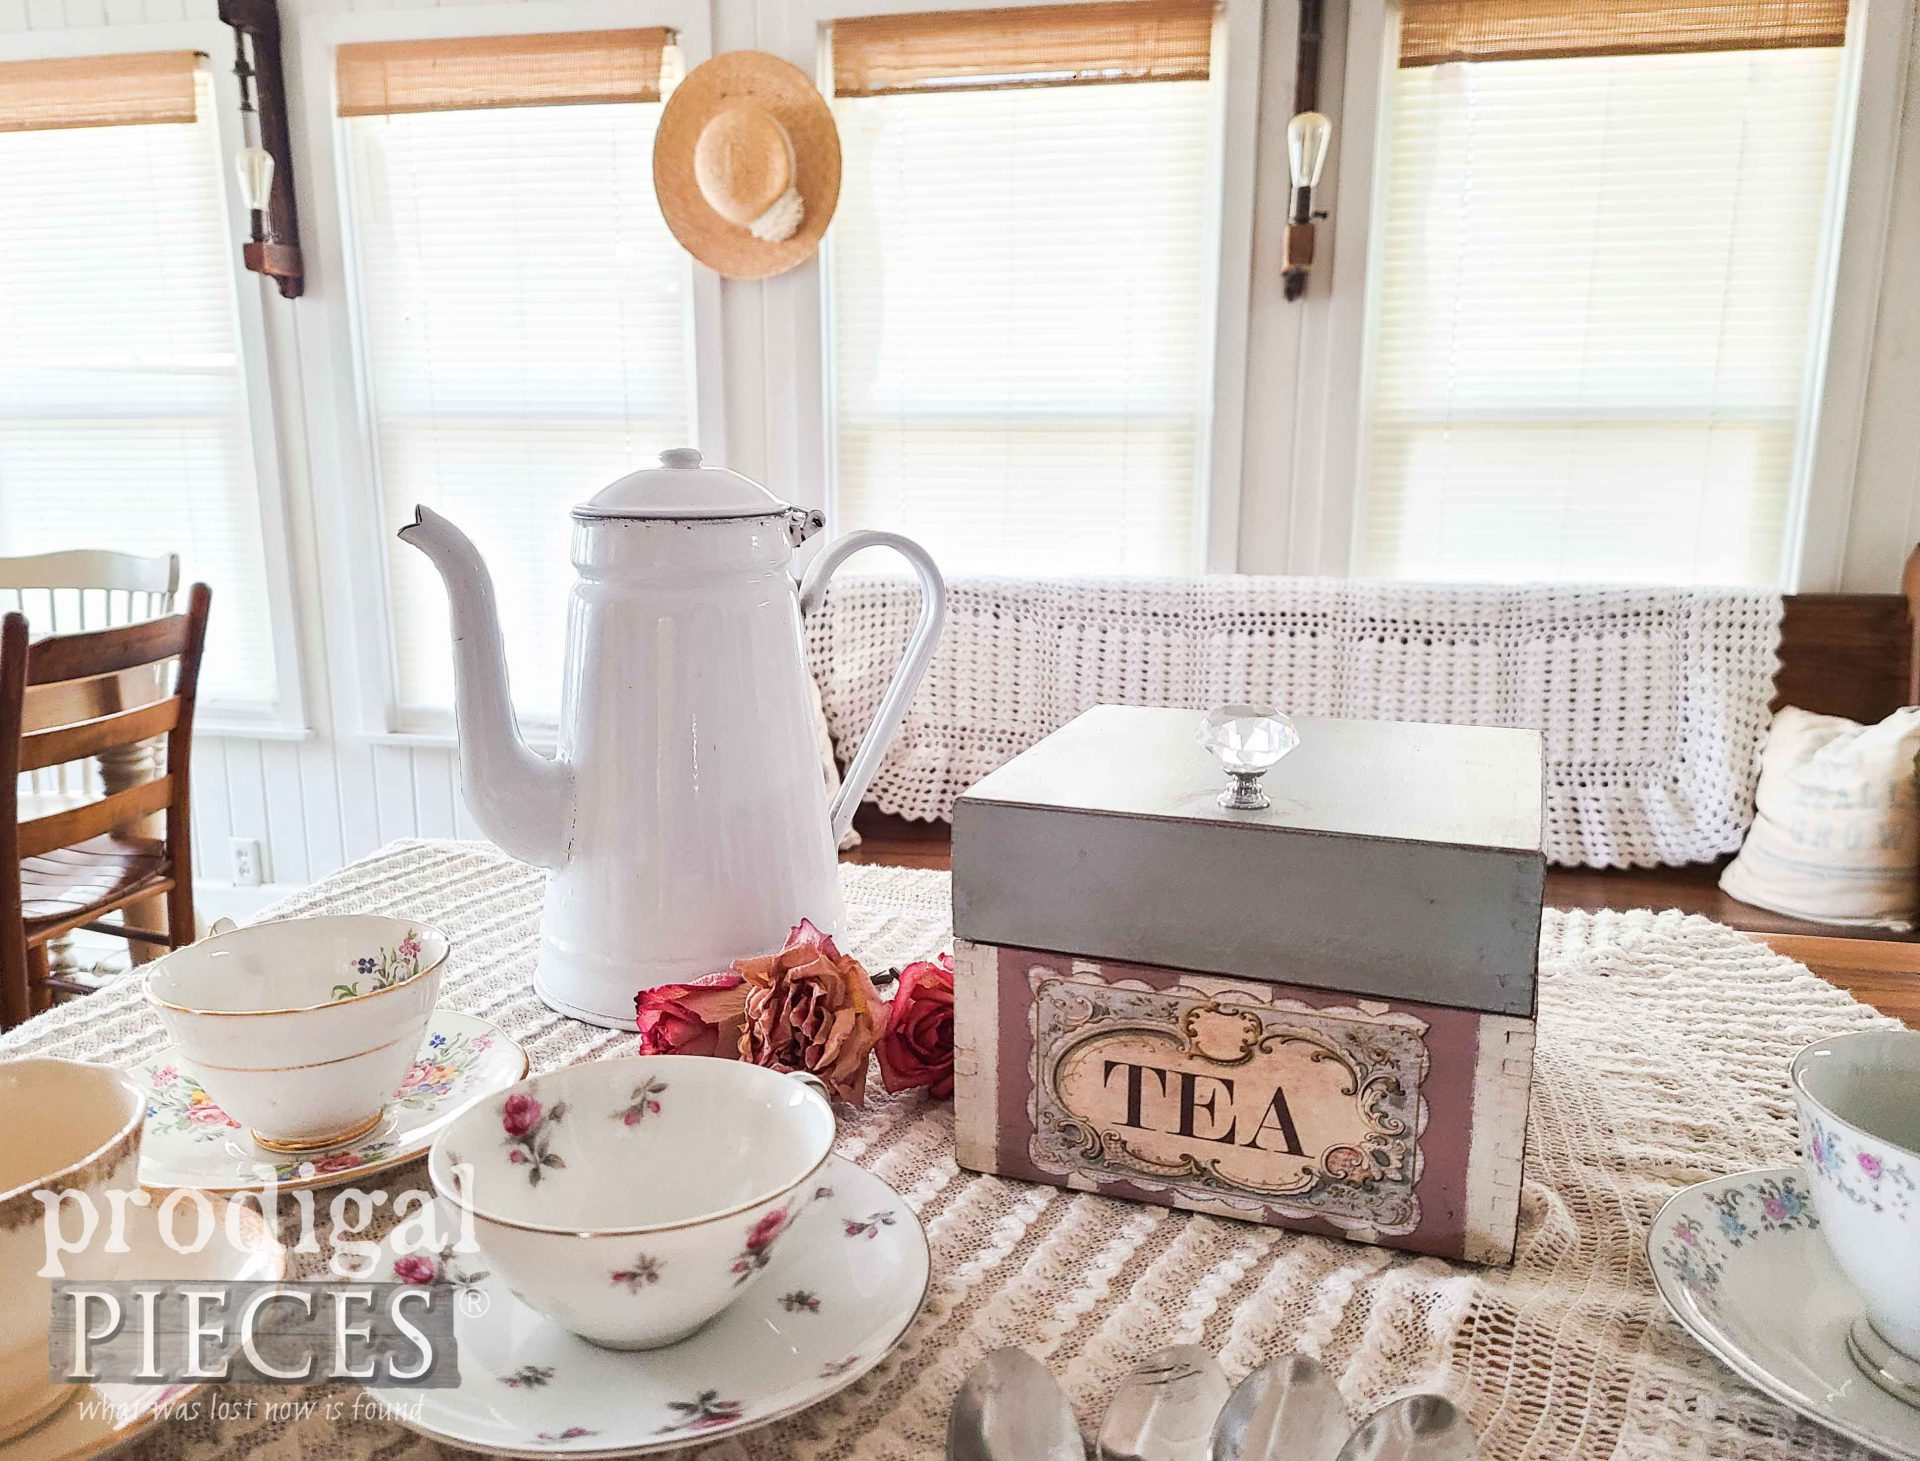 Cottage Style Tea Box by Larissa of Prodigal Pieces | See more at prodigalpieces.com #prodigalpieces #cottage #tea #vintage